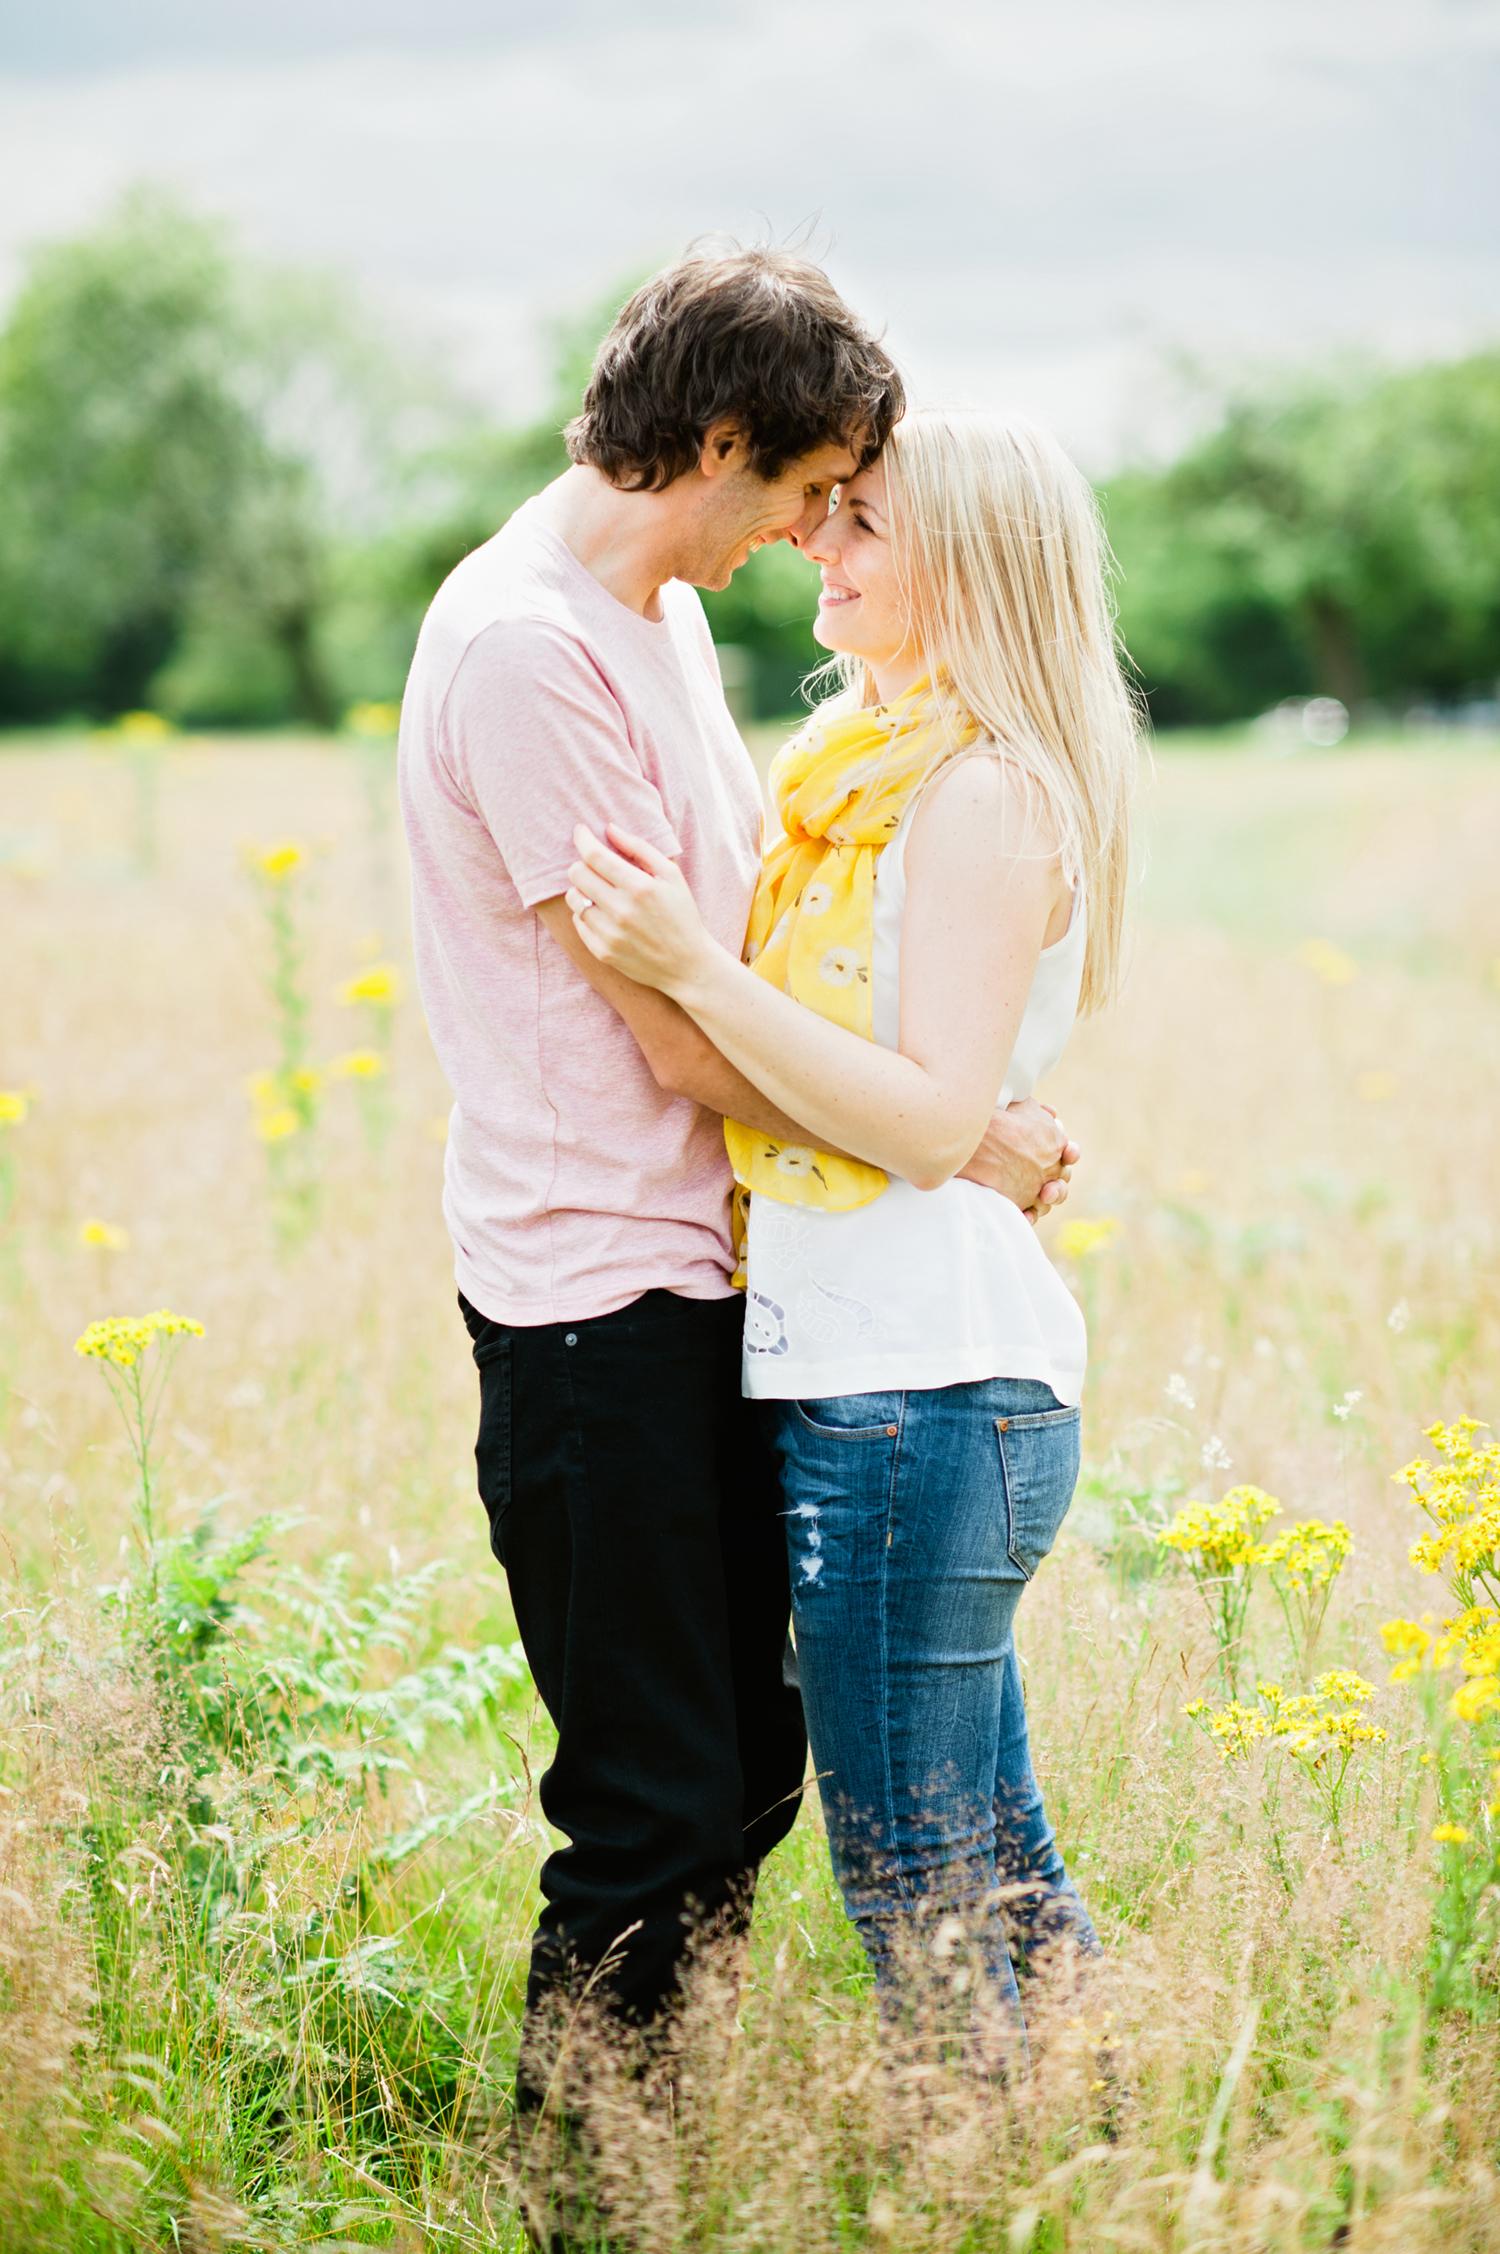 Couples-001web.jpg